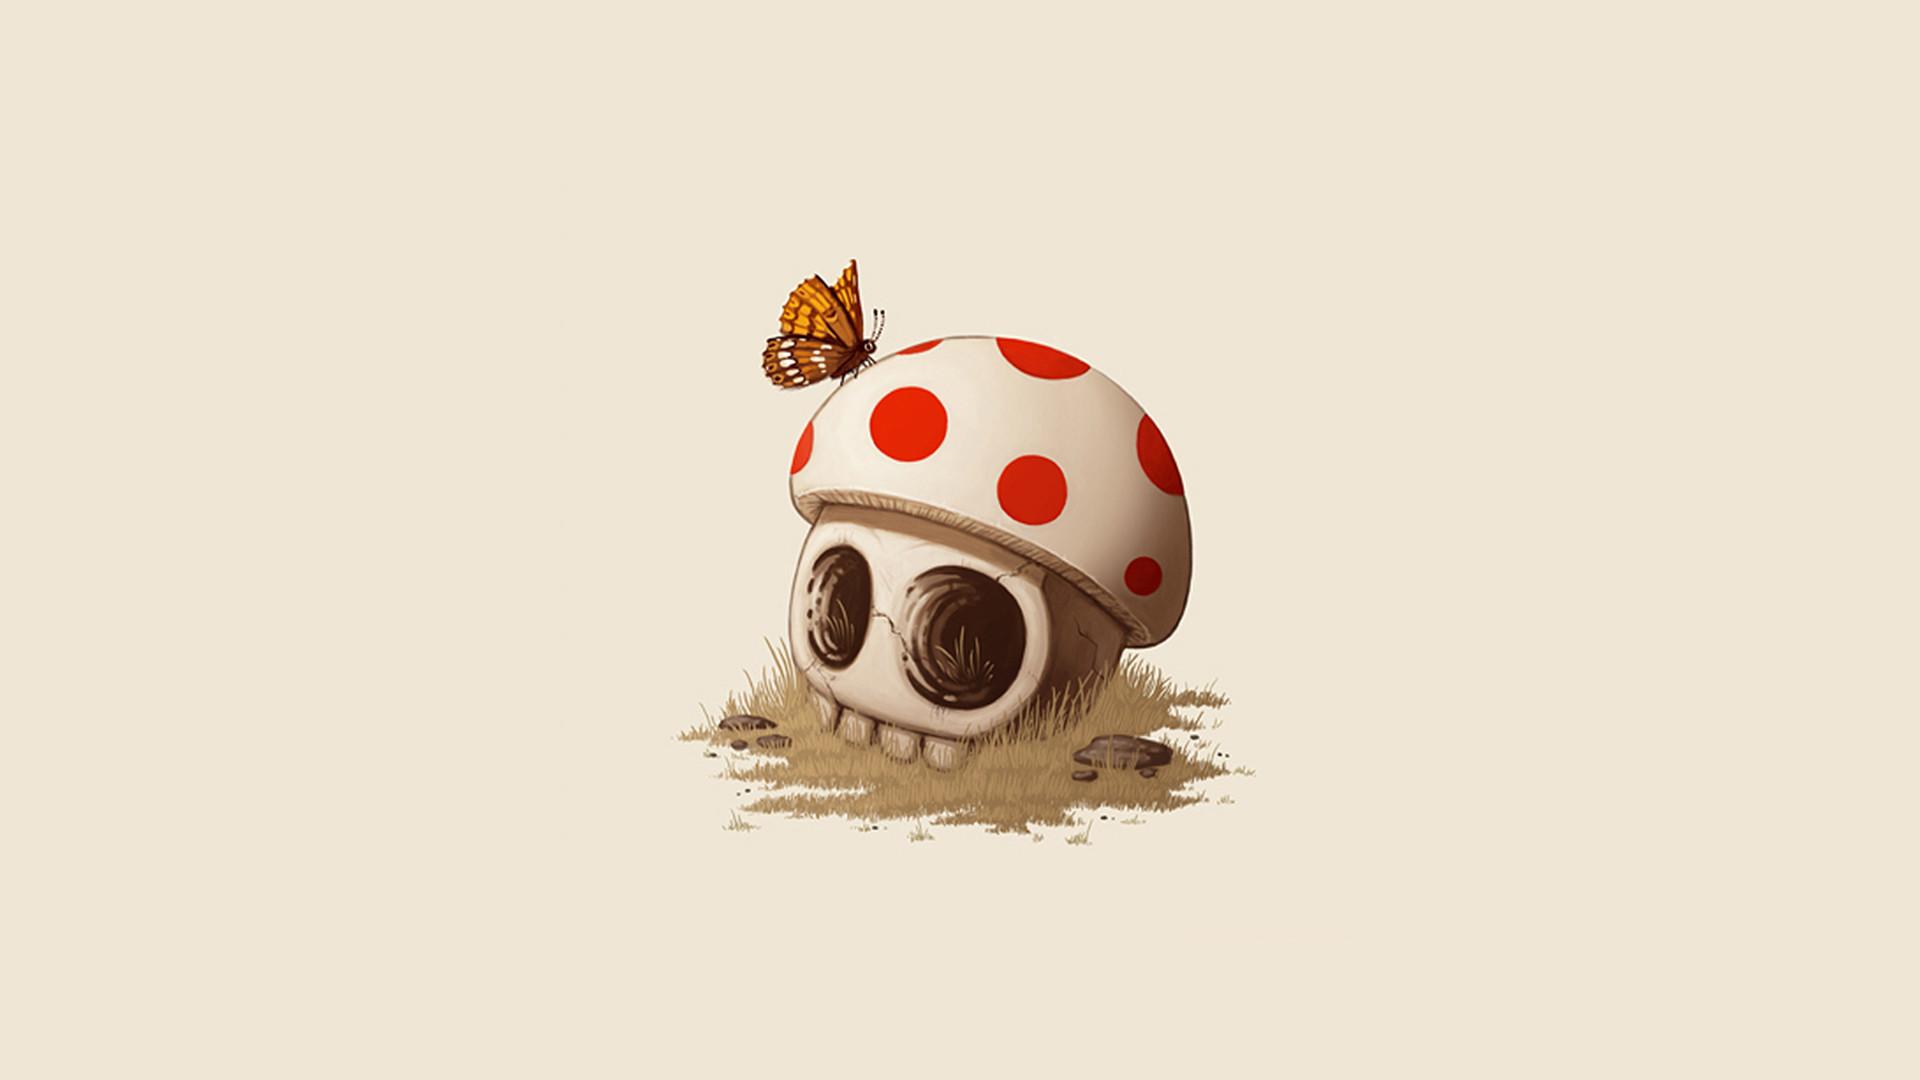 Res: 1920x1080,  Related Wallpapers: mario mushroom wallpaper